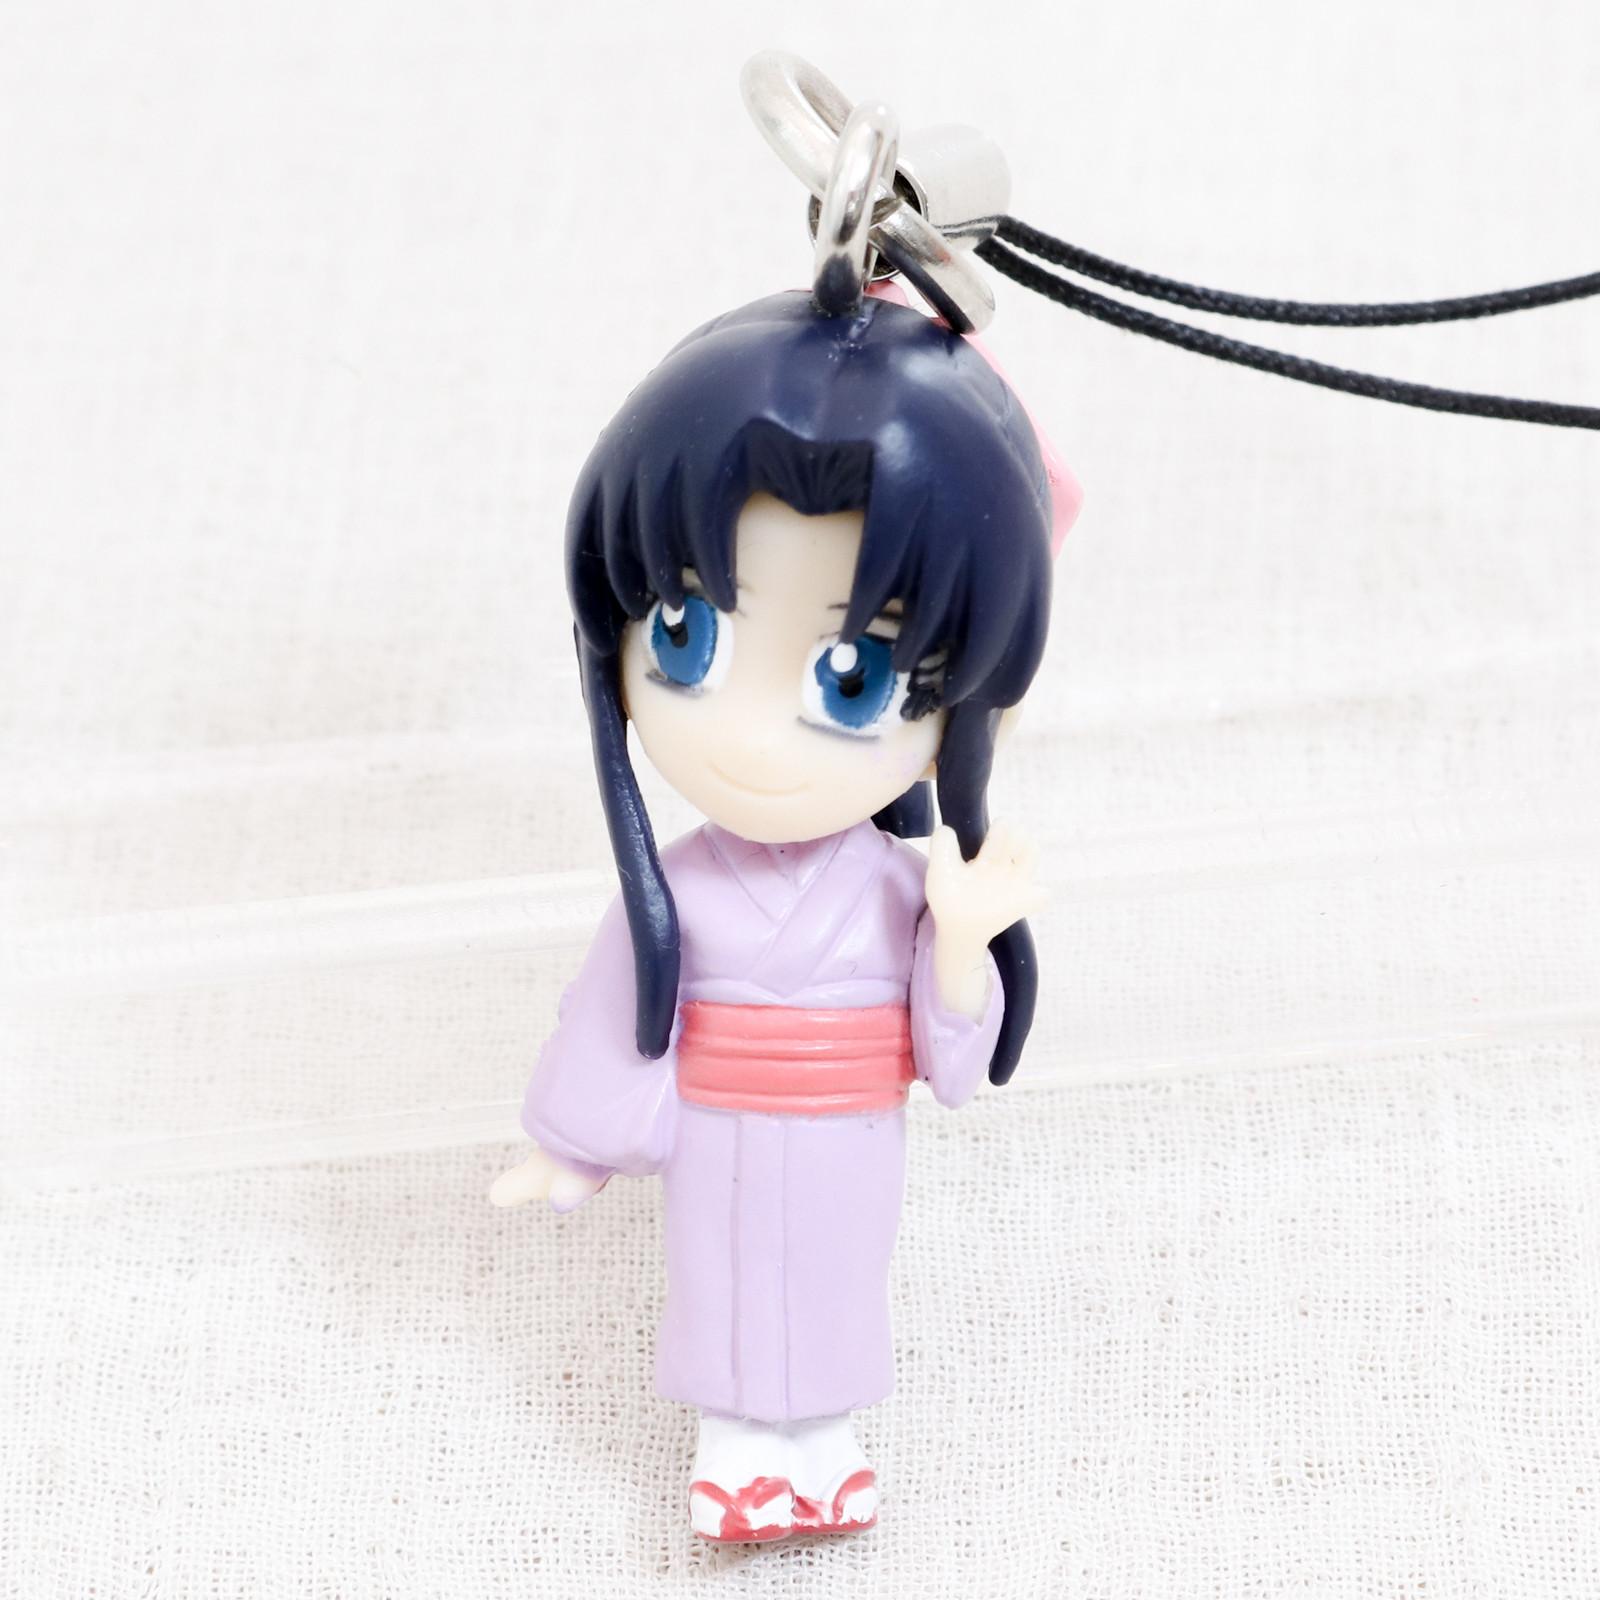 Rurouni Kenshin Kaoru Kamiya Mascot Figure Strap Bandai JAPAN ANIME MANGA